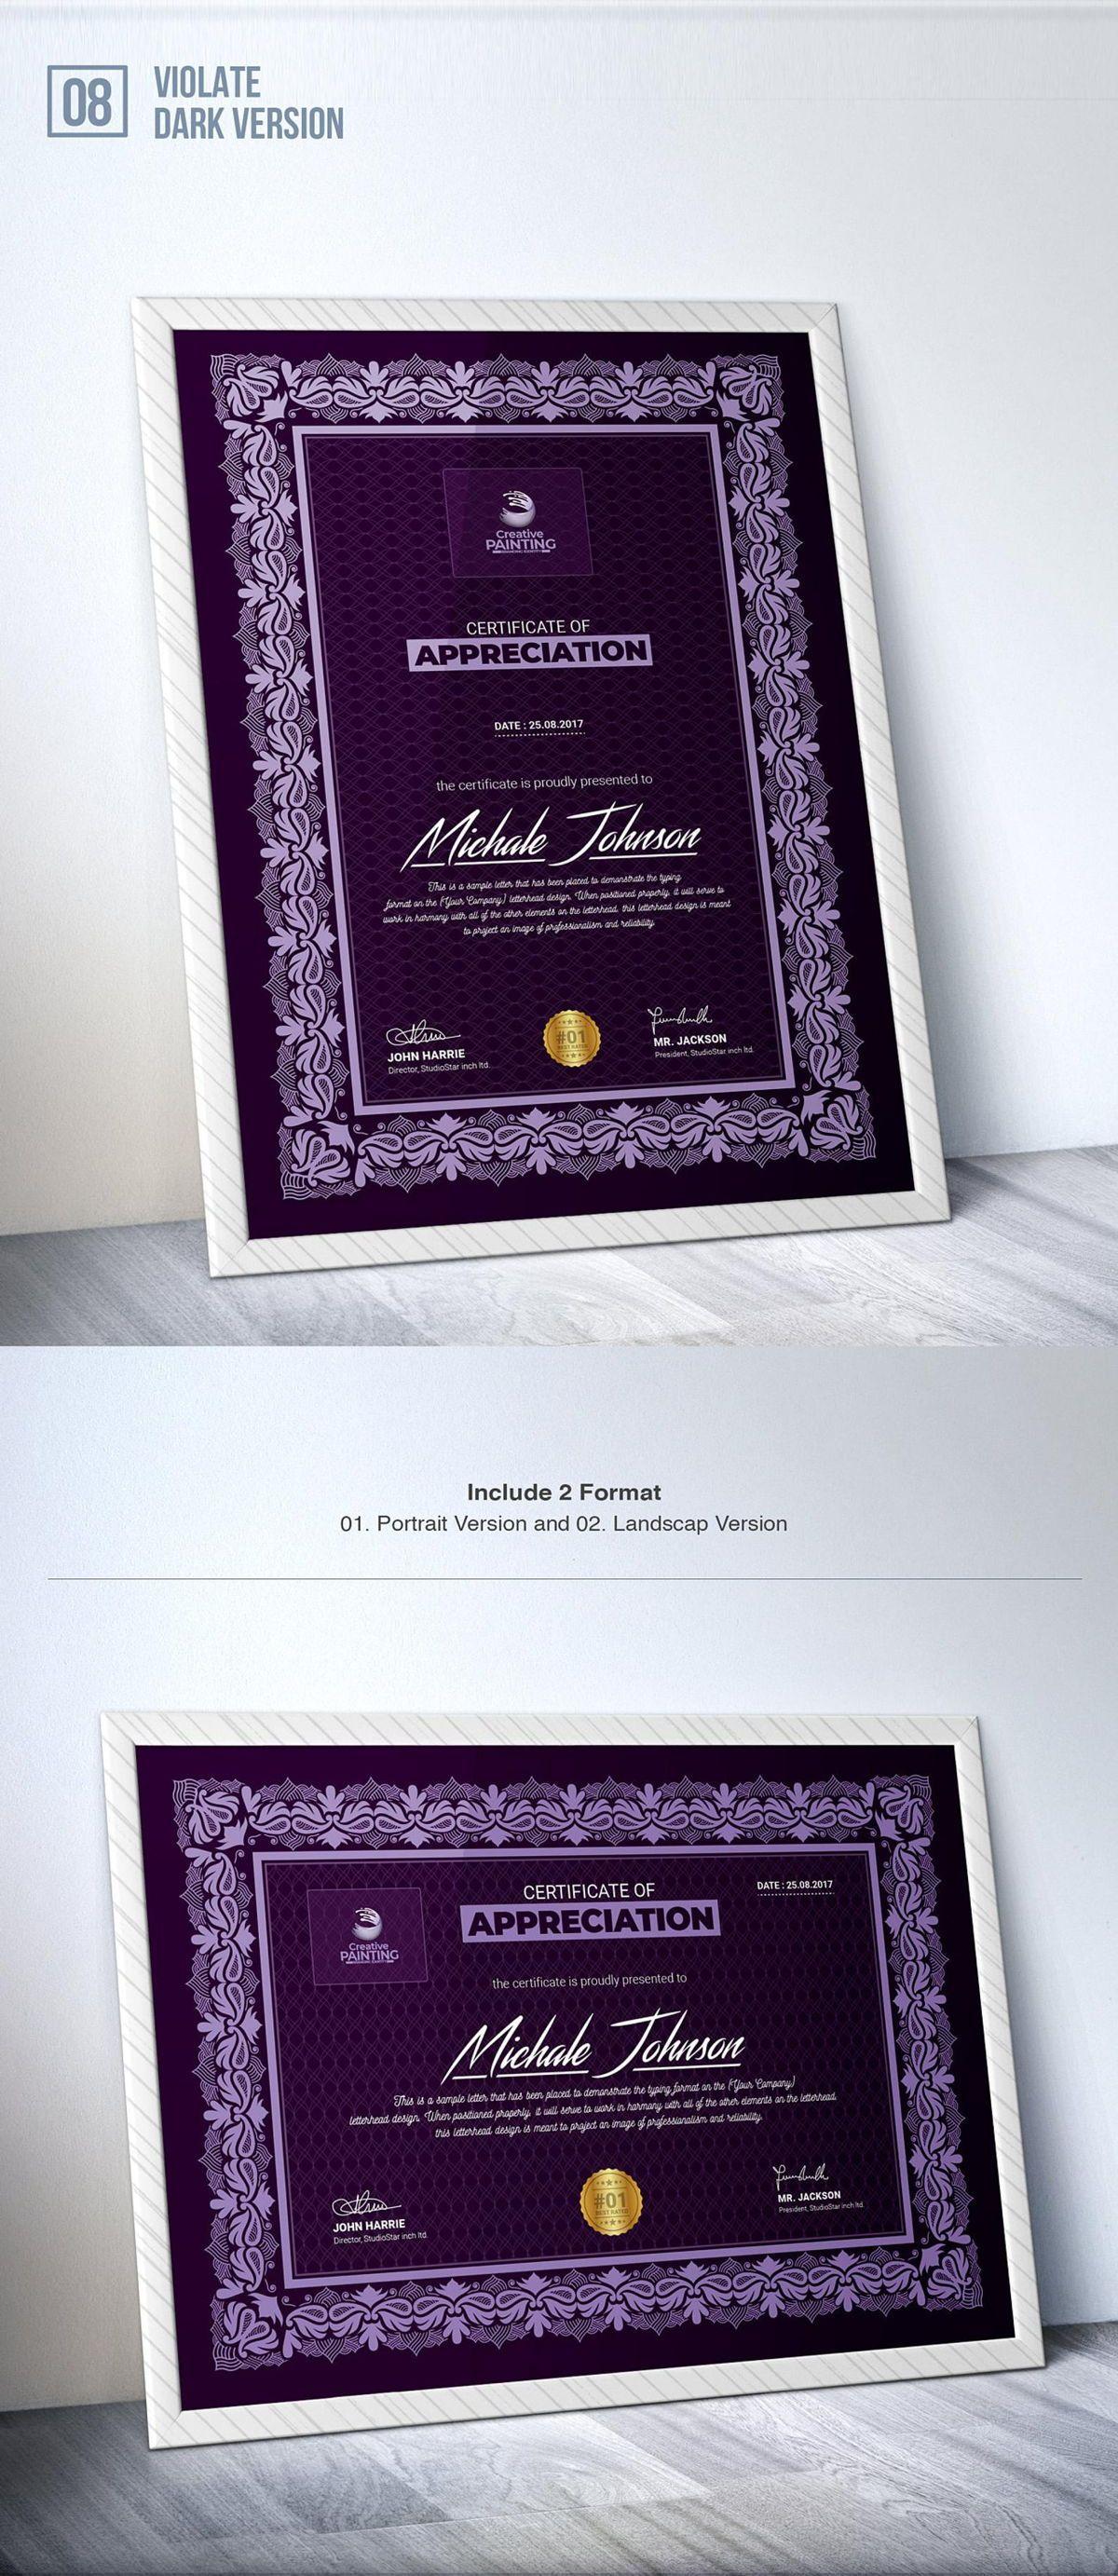 Creative Painting Certificate - 8 Colors - Dark and Light Version, Slide 10, 08755, Business — PoweredTemplate.com